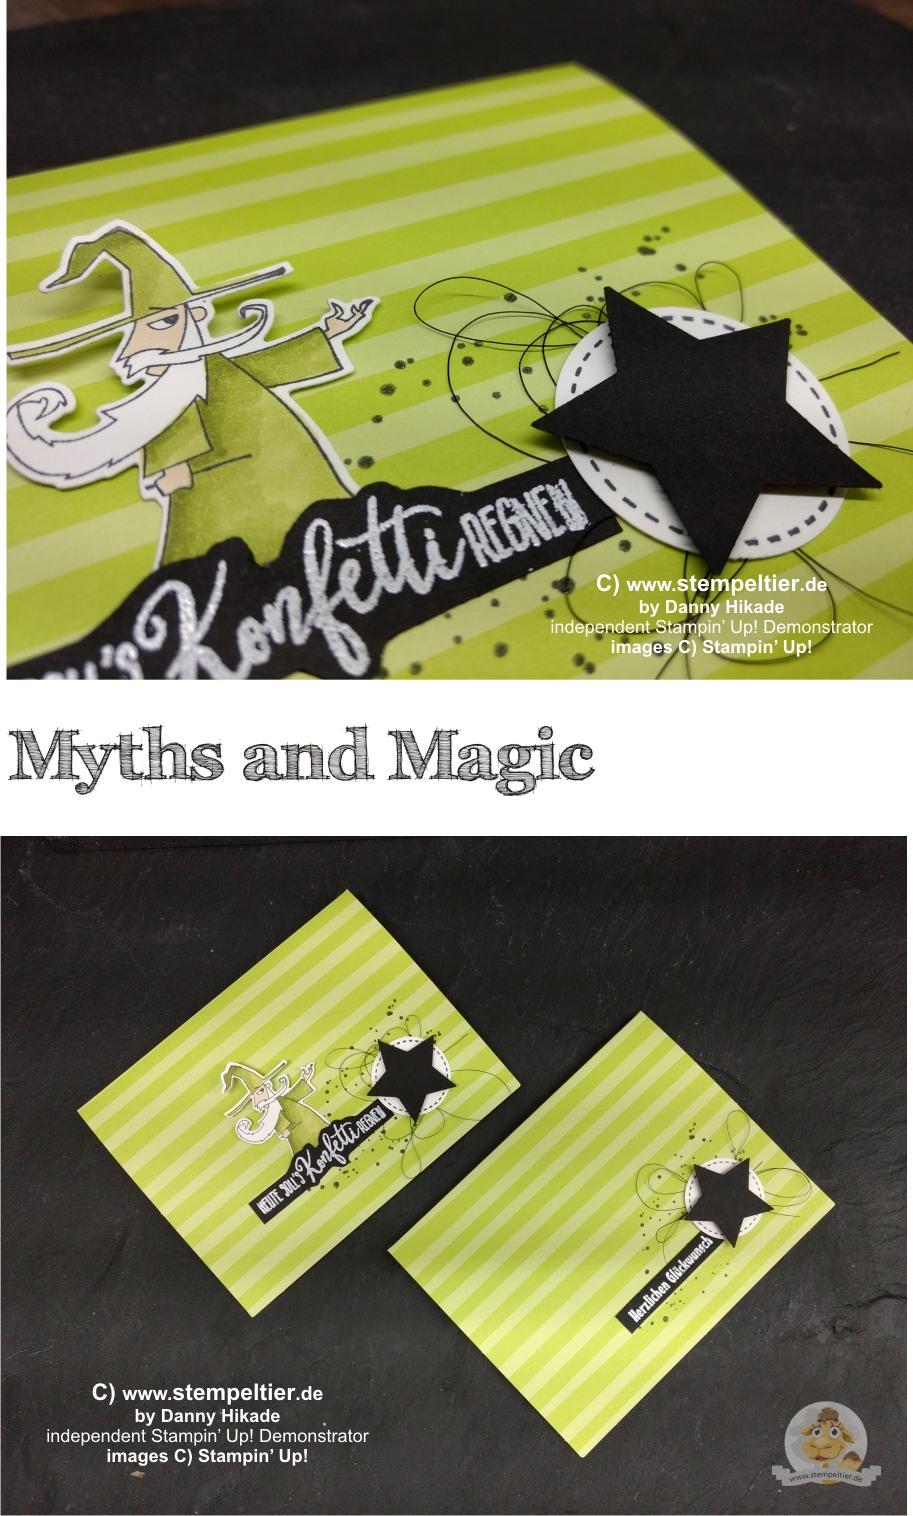 stampin up myths and magic suite sorcerer stempeltier